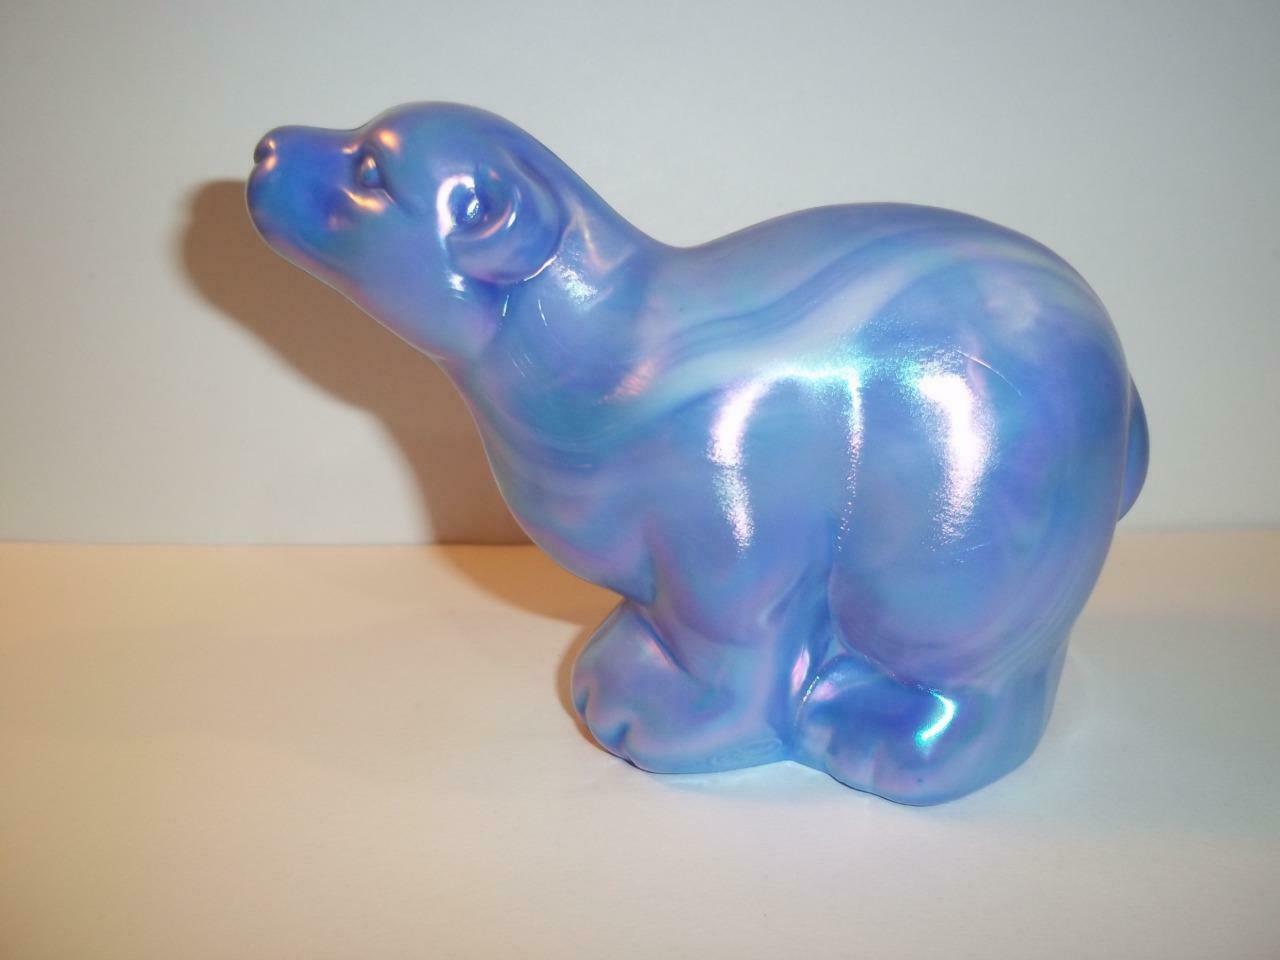 Fenton Glass Cobalt Blue & White Slag Iridized Carnival Polar Bear Figurine QVC